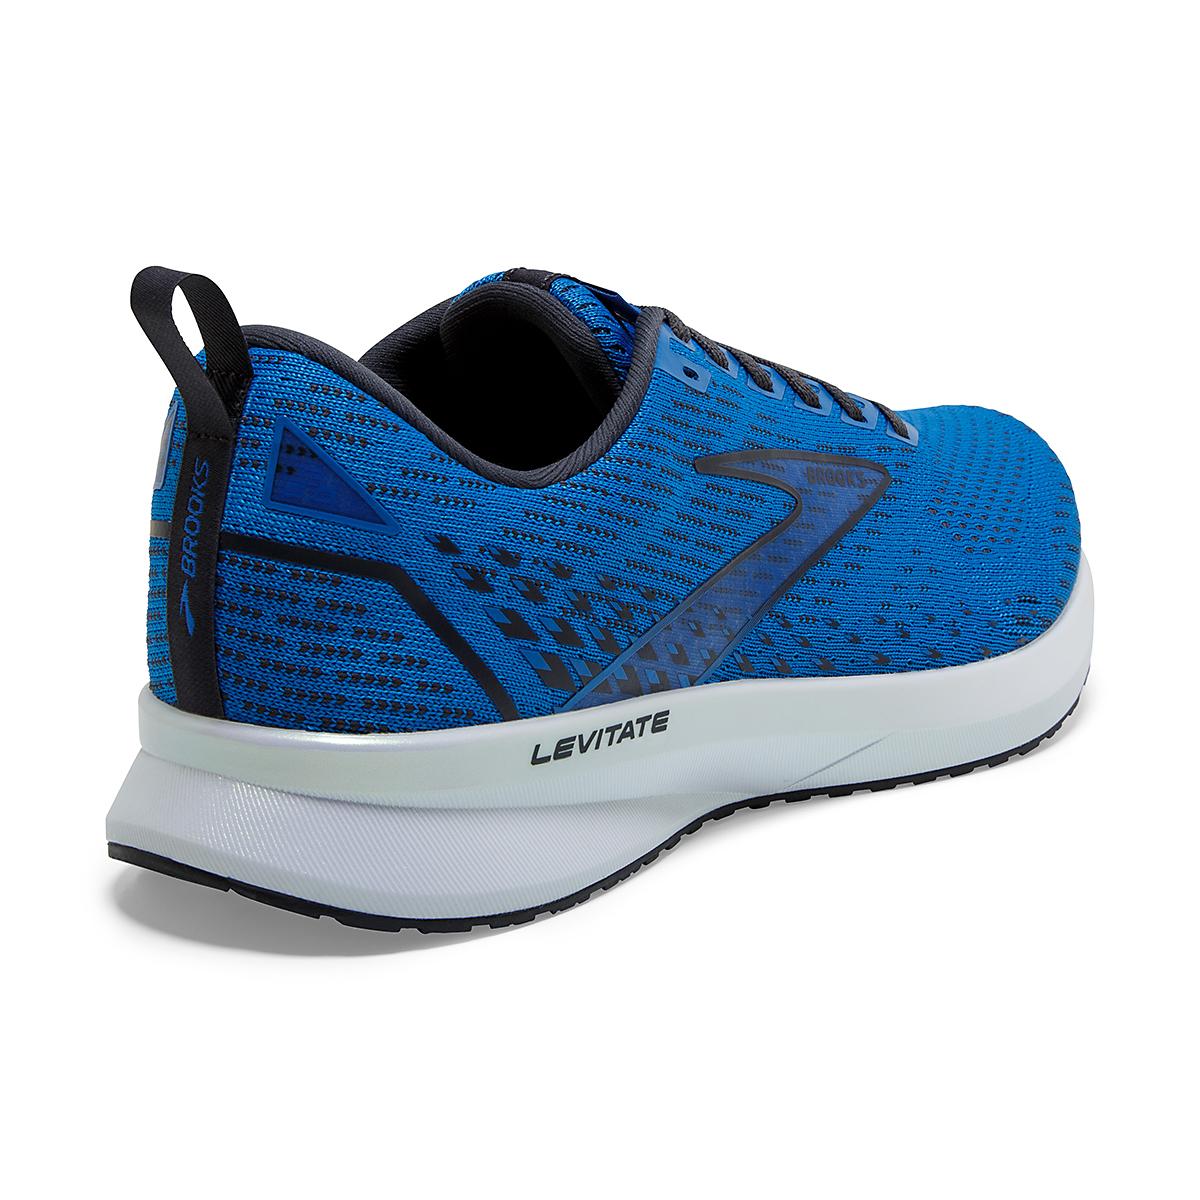 Men's Brooks Levitate 5 Running Shoe - Color: Blue/India Ink/White - Size: 7 - Width: Regular, Blue/India Ink/White, large, image 3